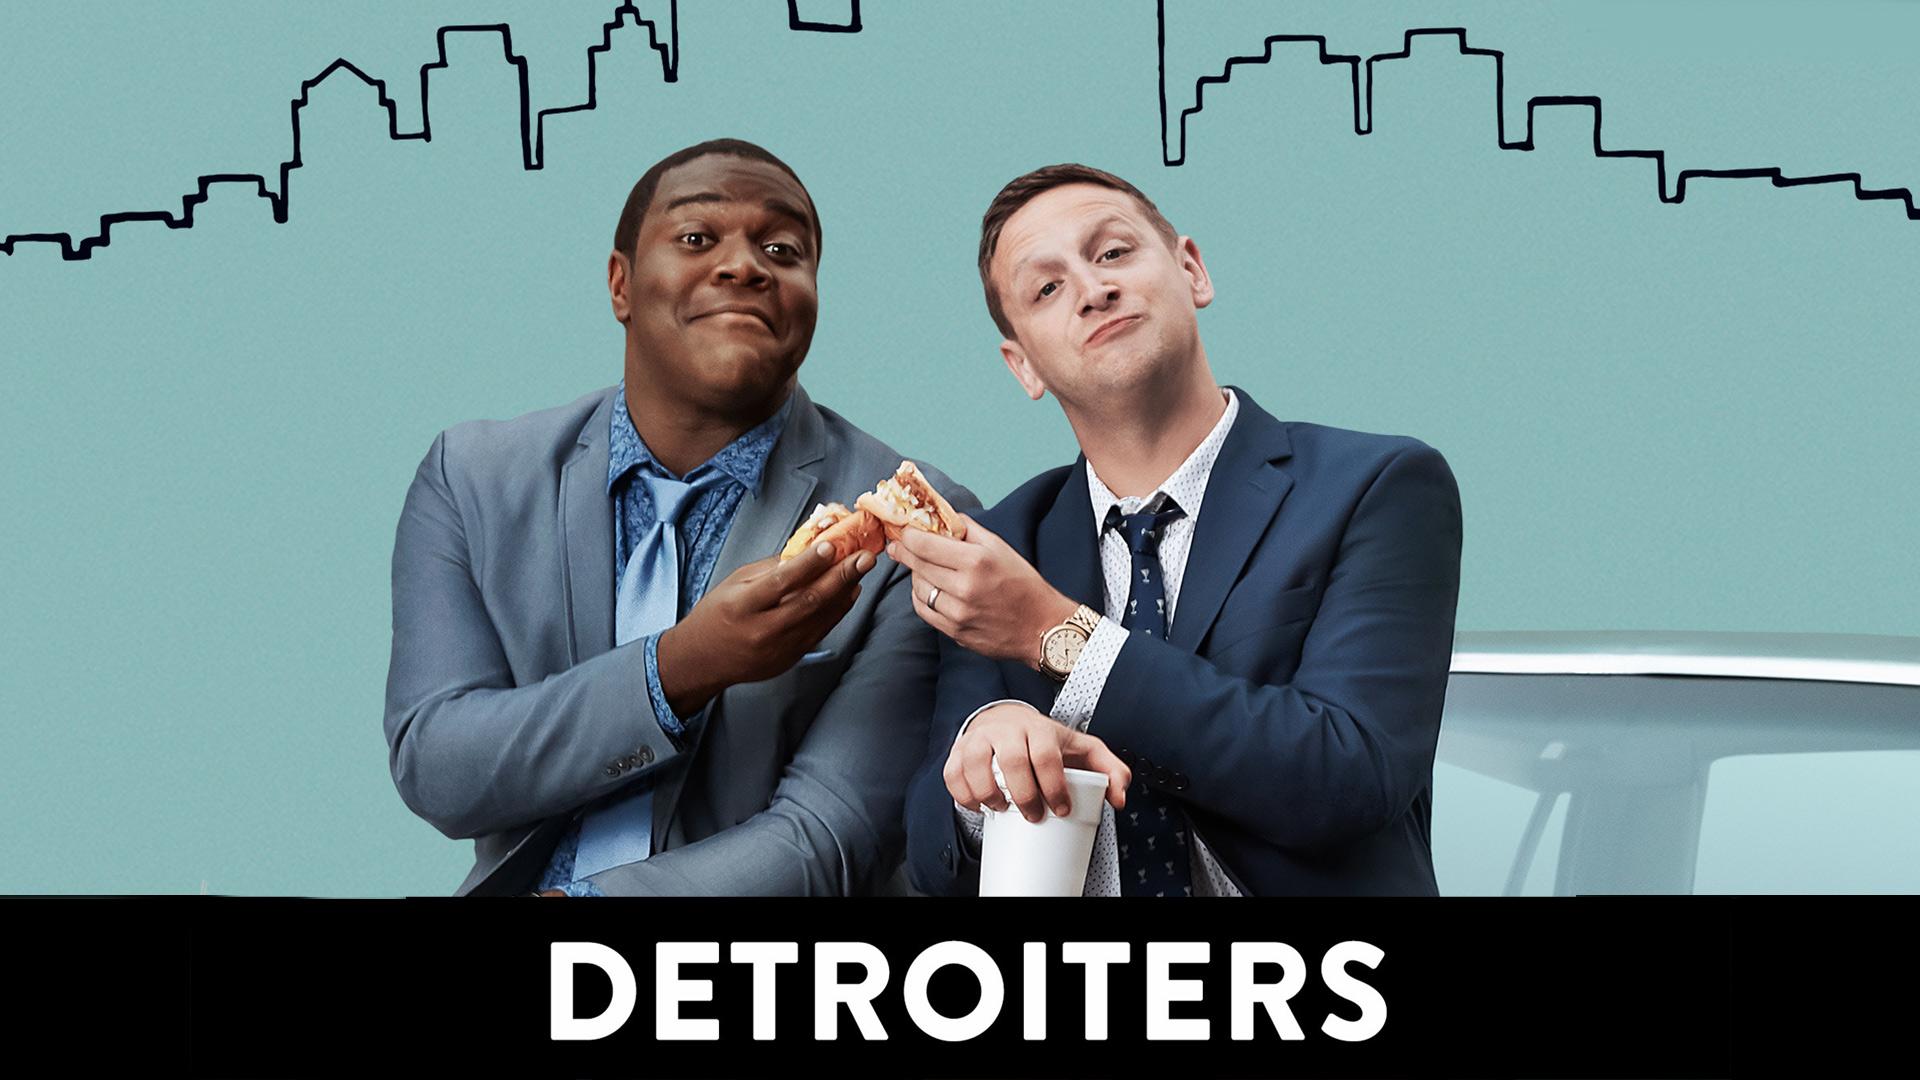 Detroiters Season 1